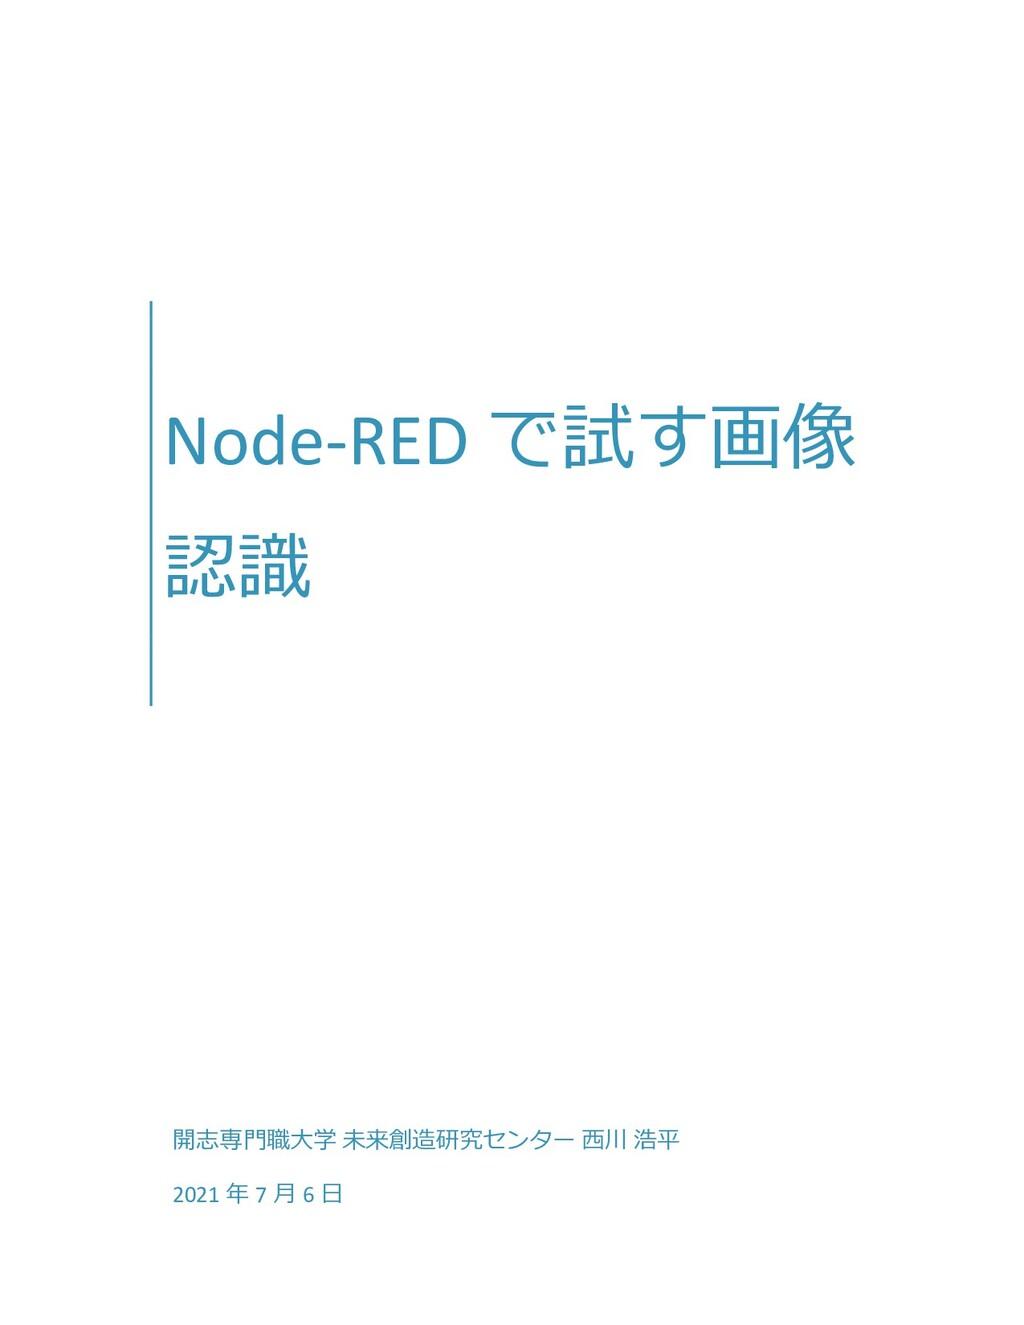 Node-RED で試す画像 認識 開志専門職大学 未来創造研究センター 西川 浩平 2021...